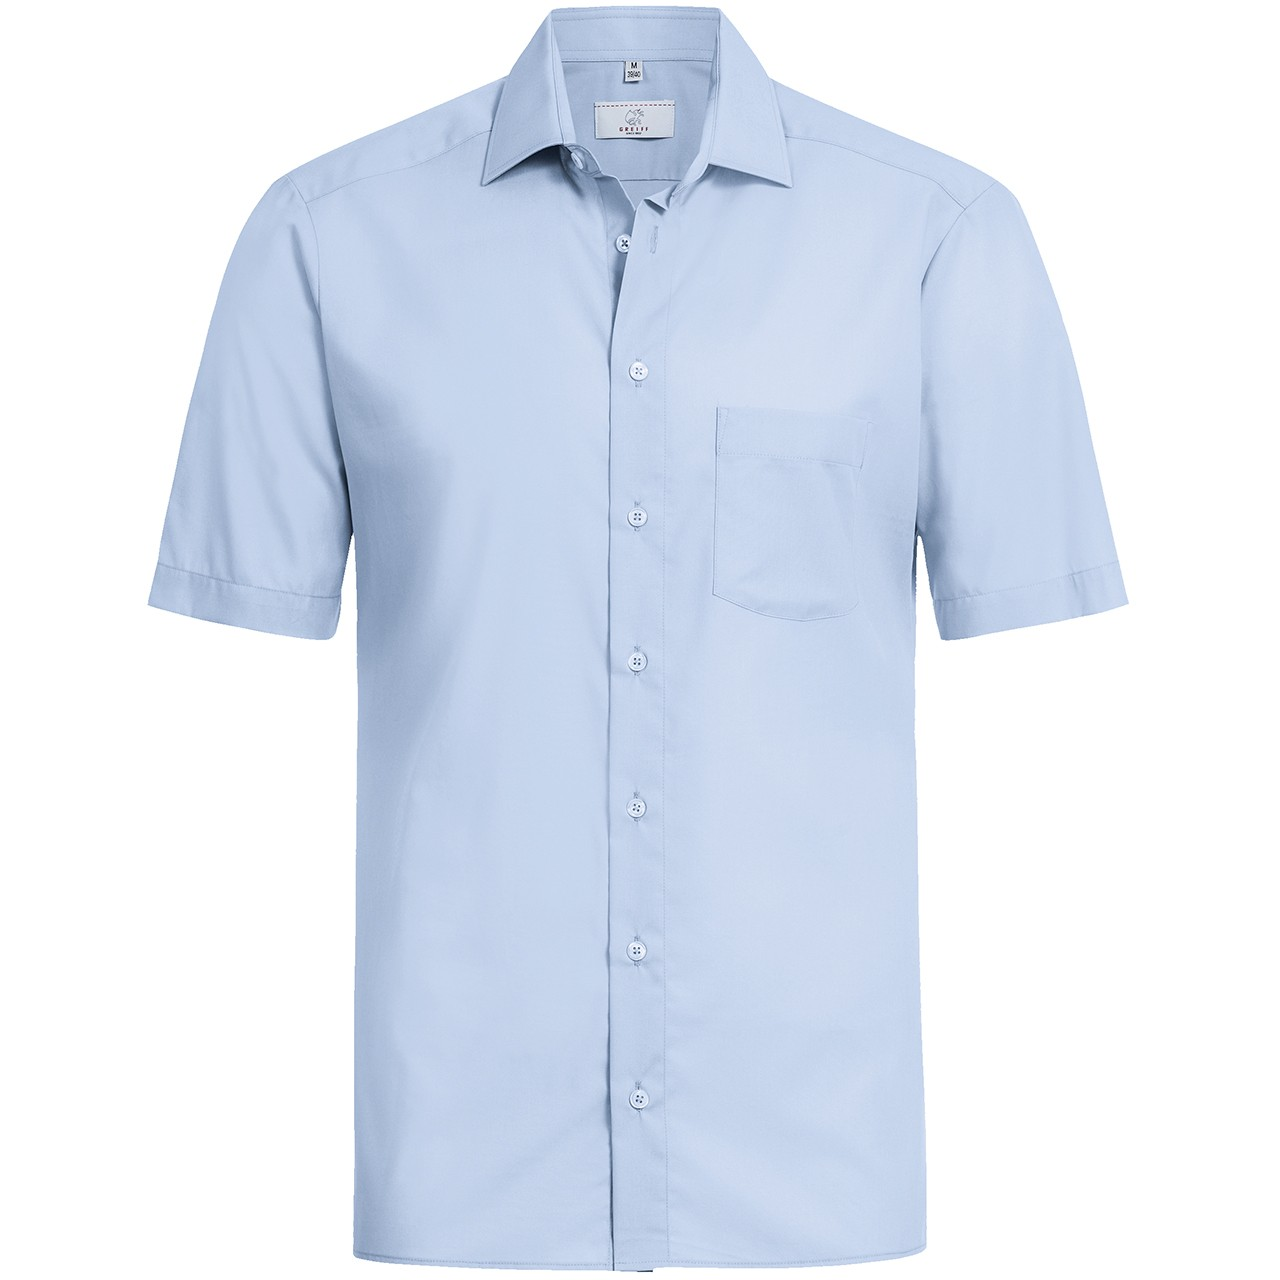 Basic Hemd Kurzarm Regular Fit Greiff® | bedrucken, besticken, bedrucken lassen, besticken lassen, mit Logo |